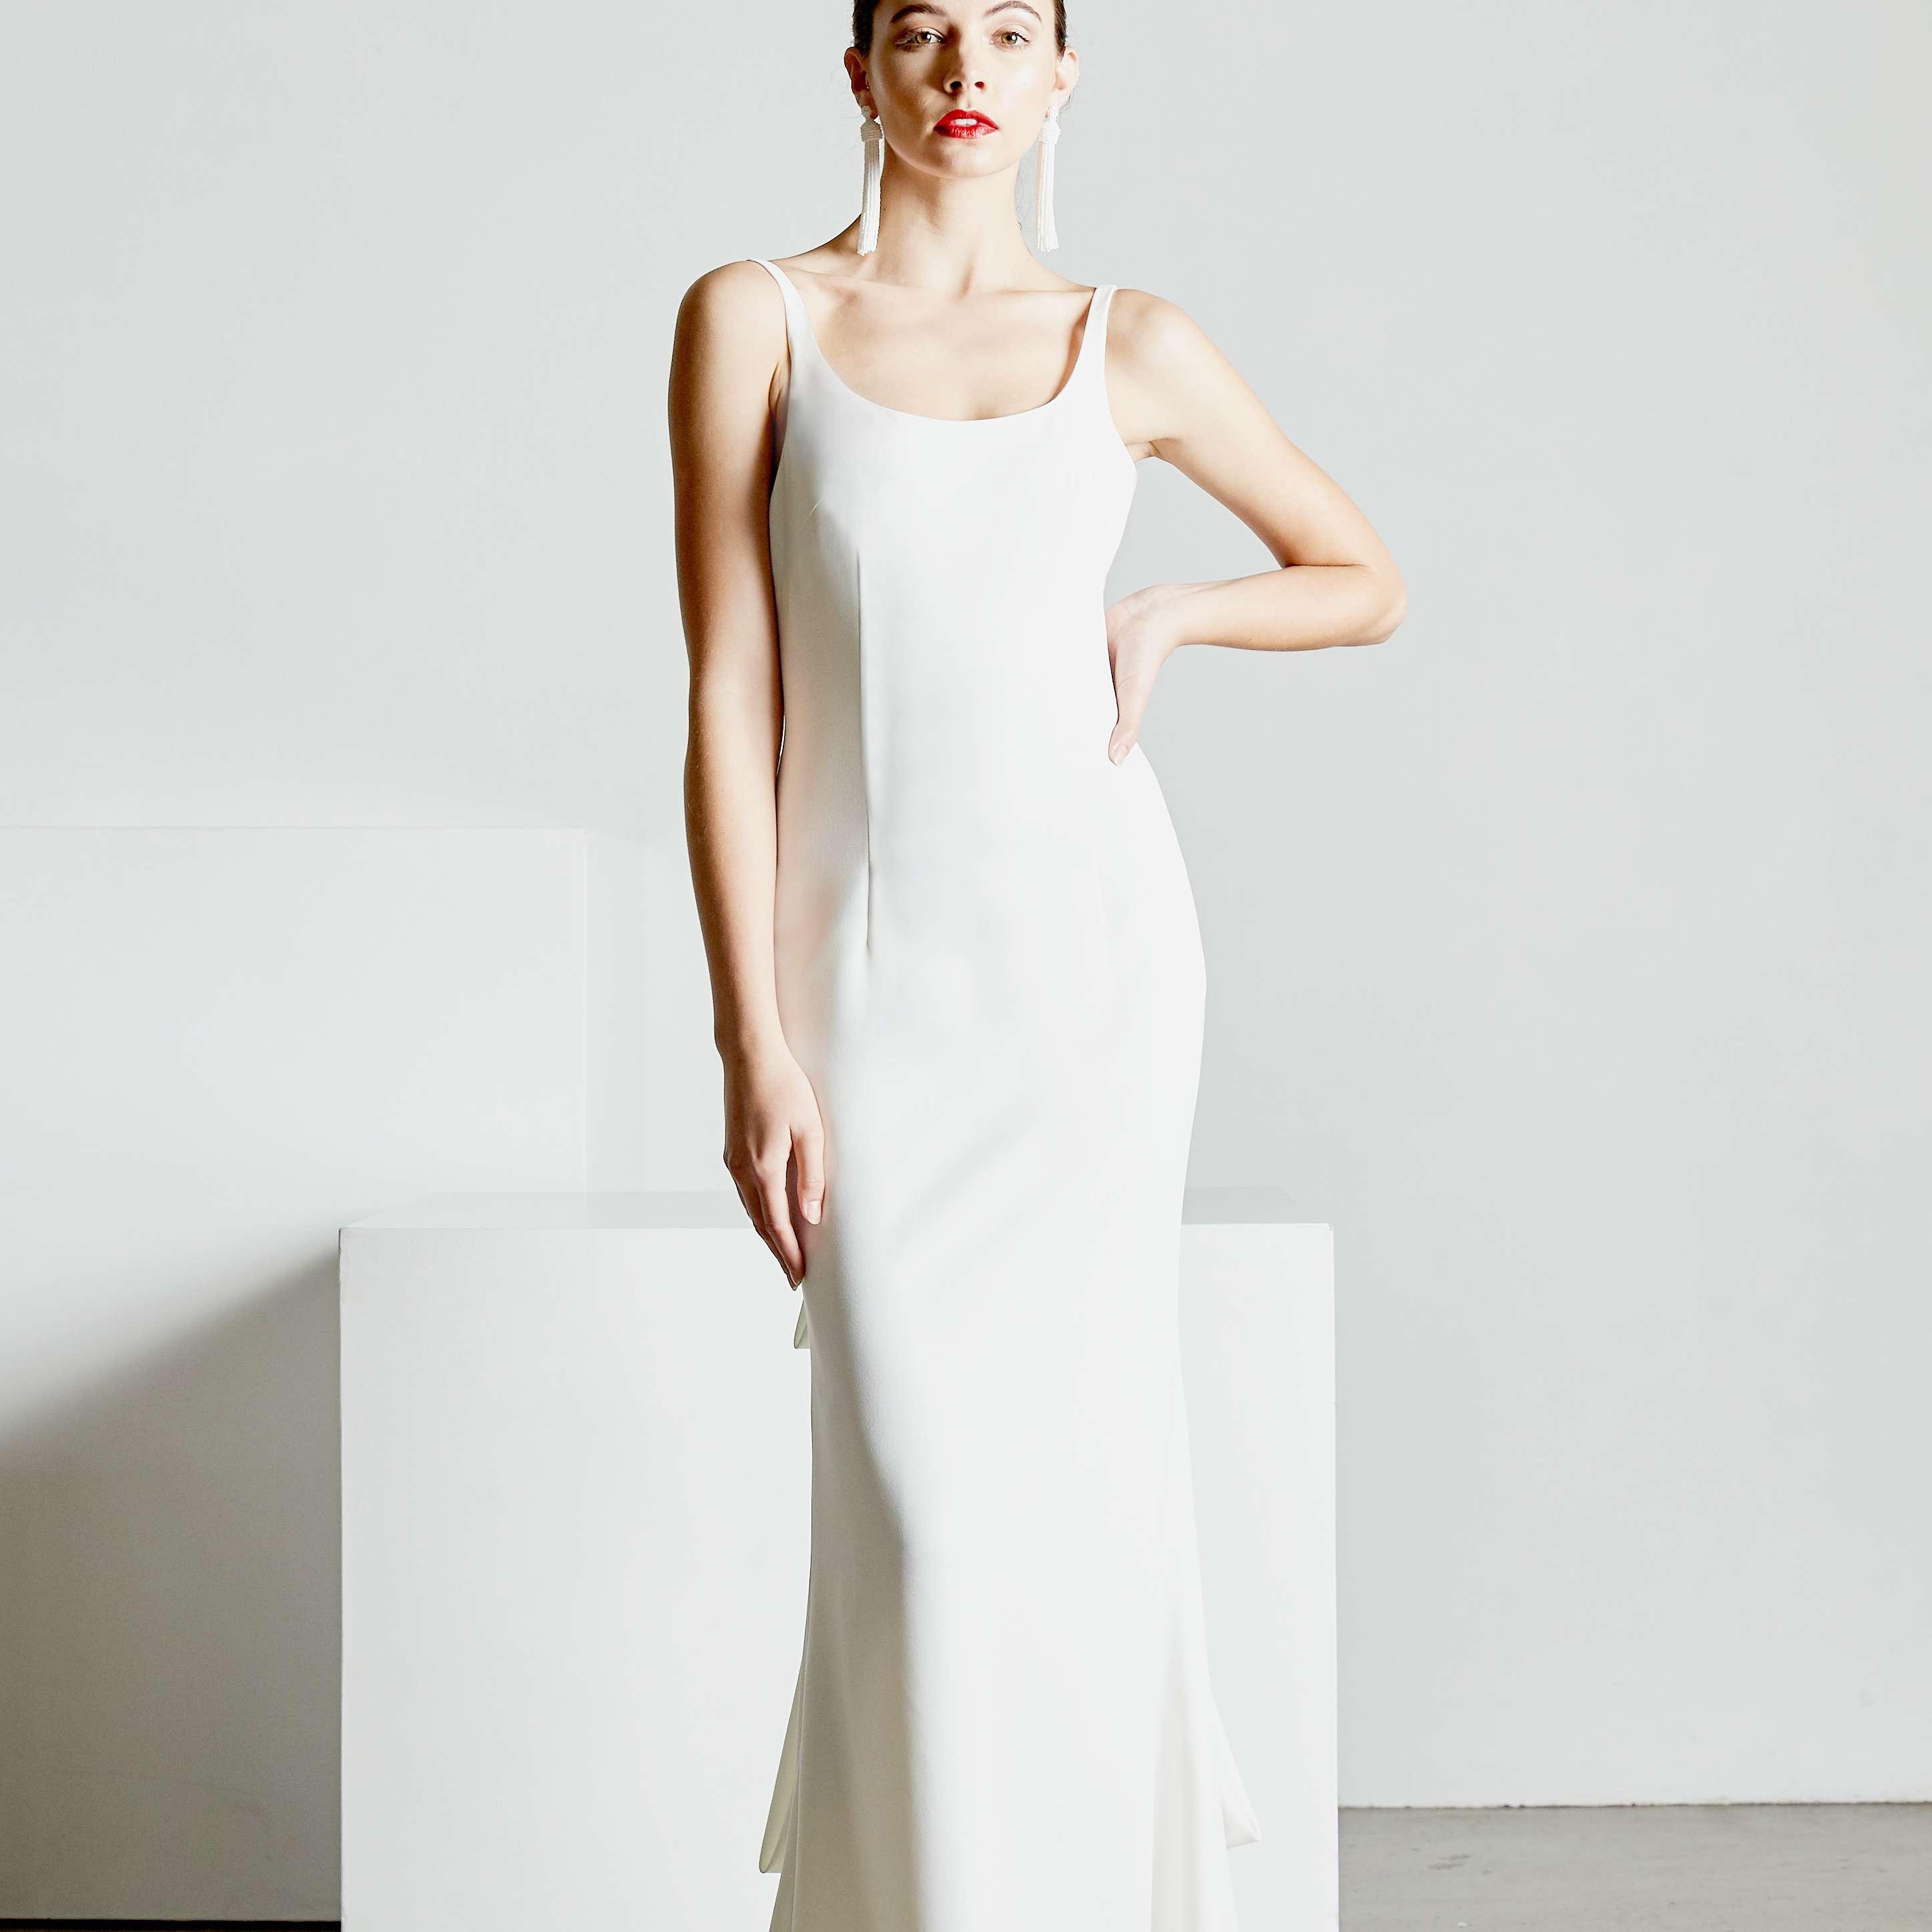 Megan S Wedding Dress.19 Wedding Dresses To Get Meghan Markle S Wedding Dress Look